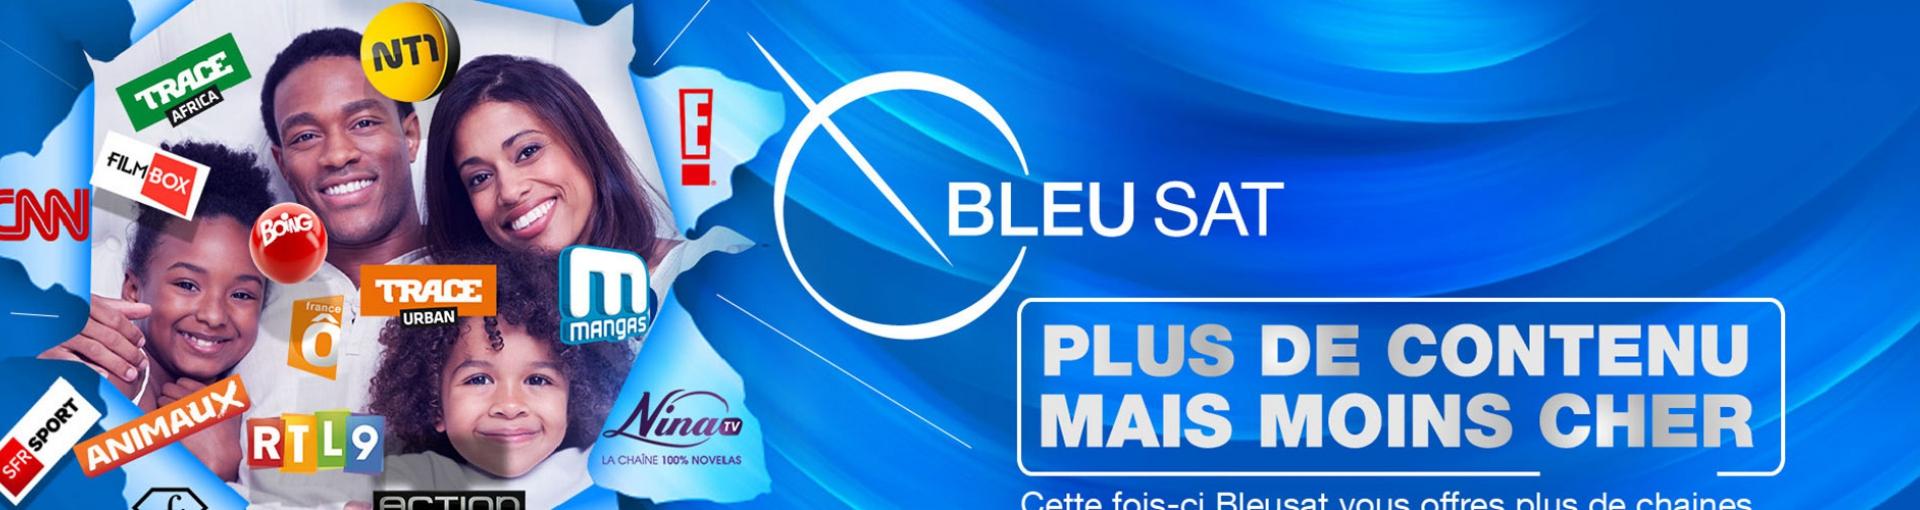 bleusat